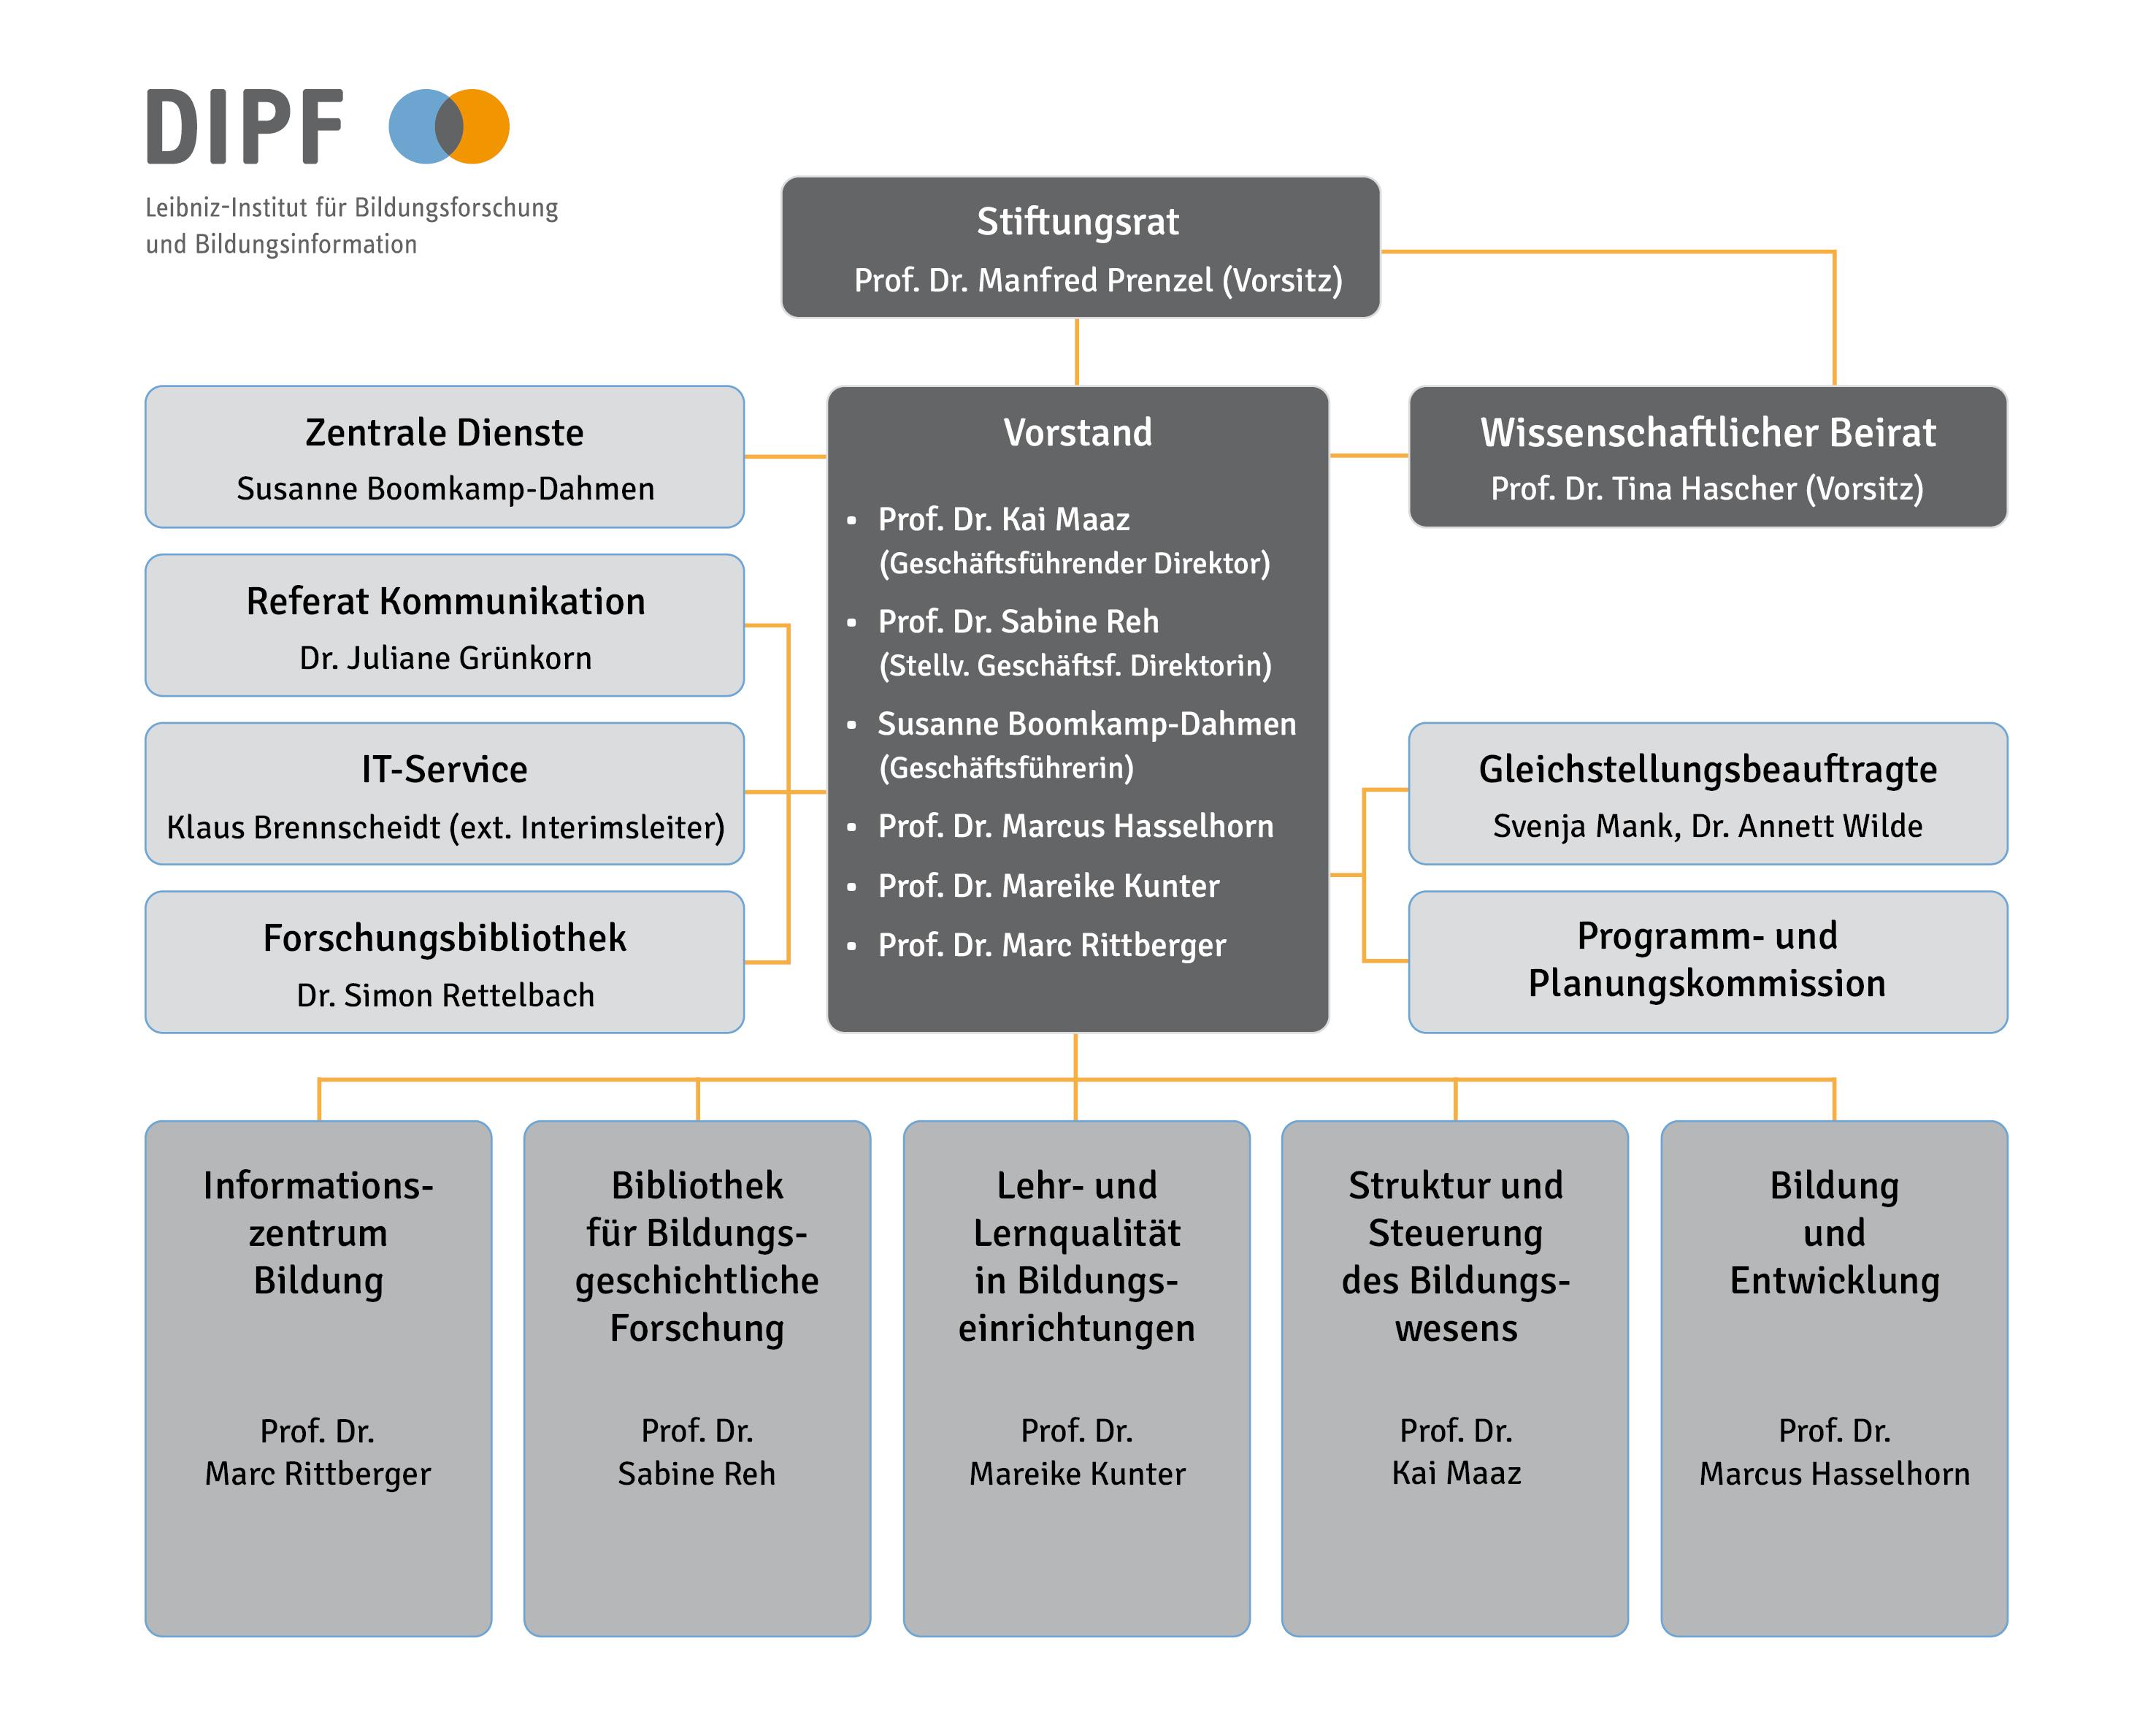 DIPF-Organigramm 2021-01-01